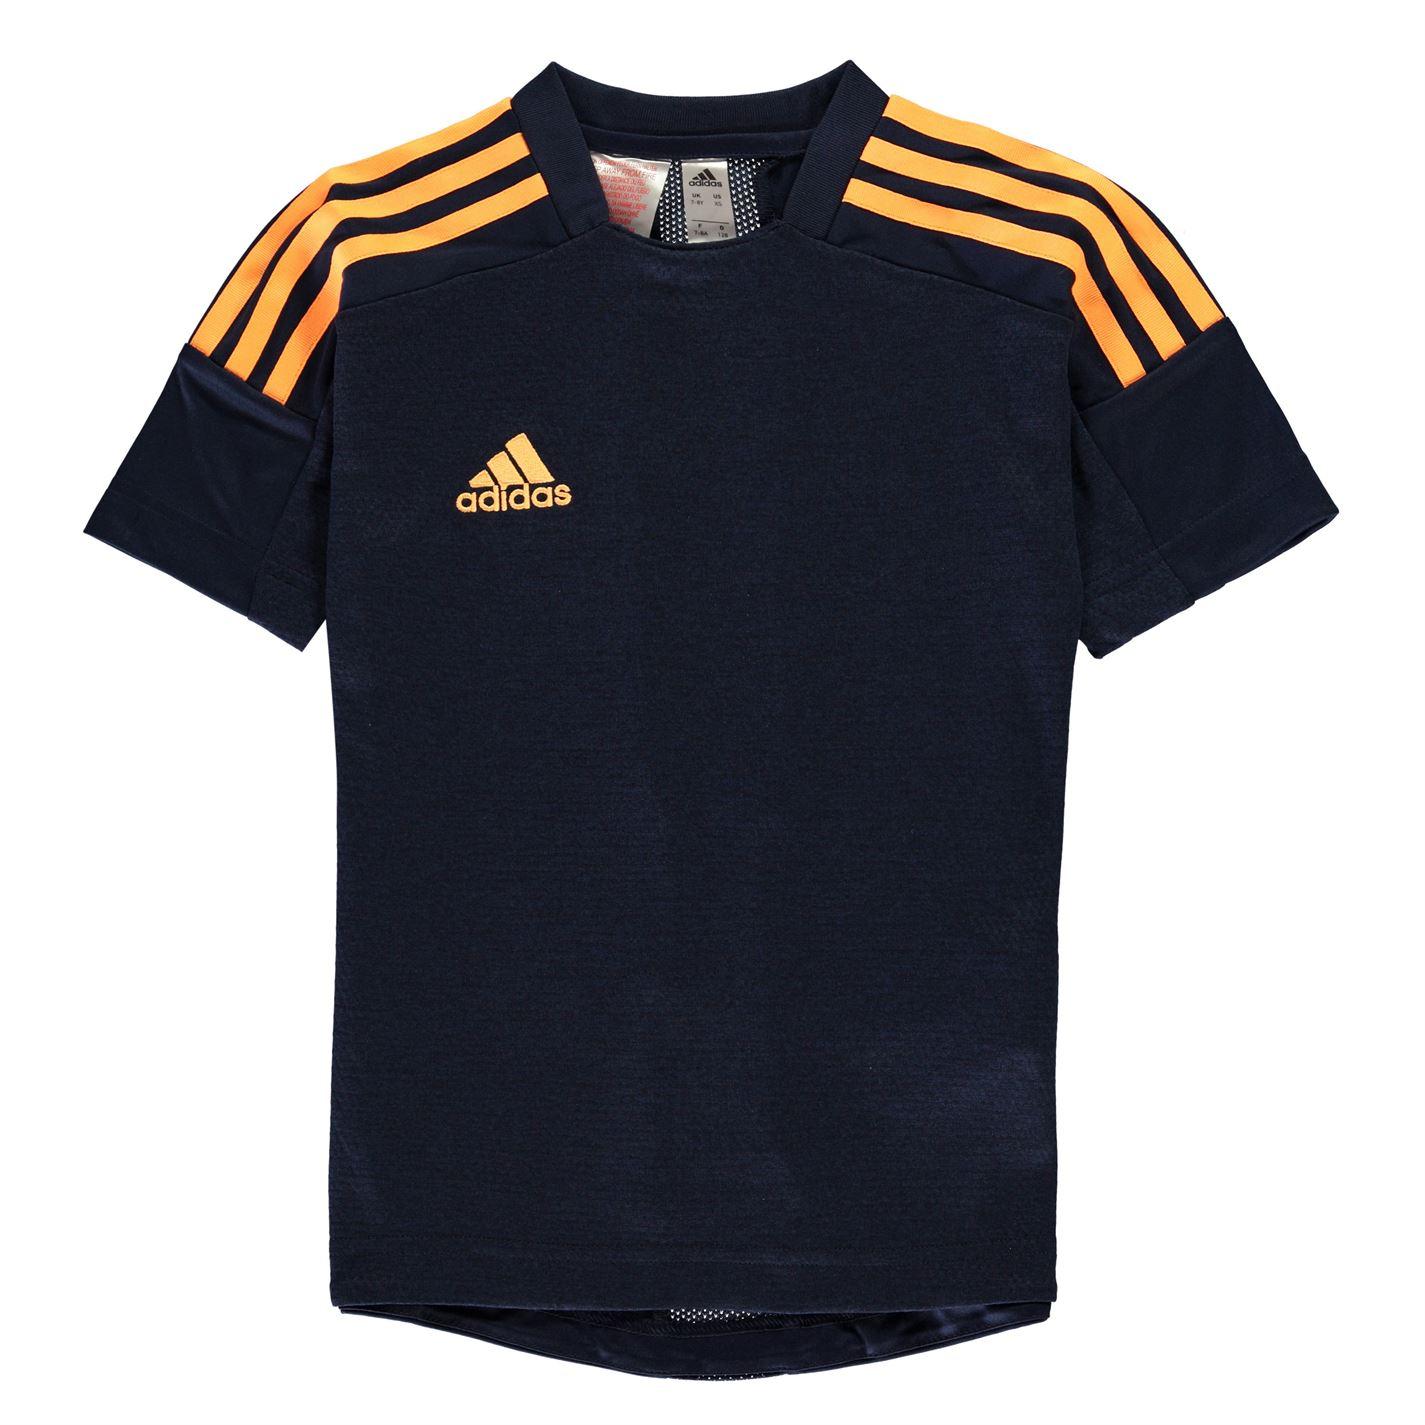 Adidas Sereno Pro T Shirt Junior Boys